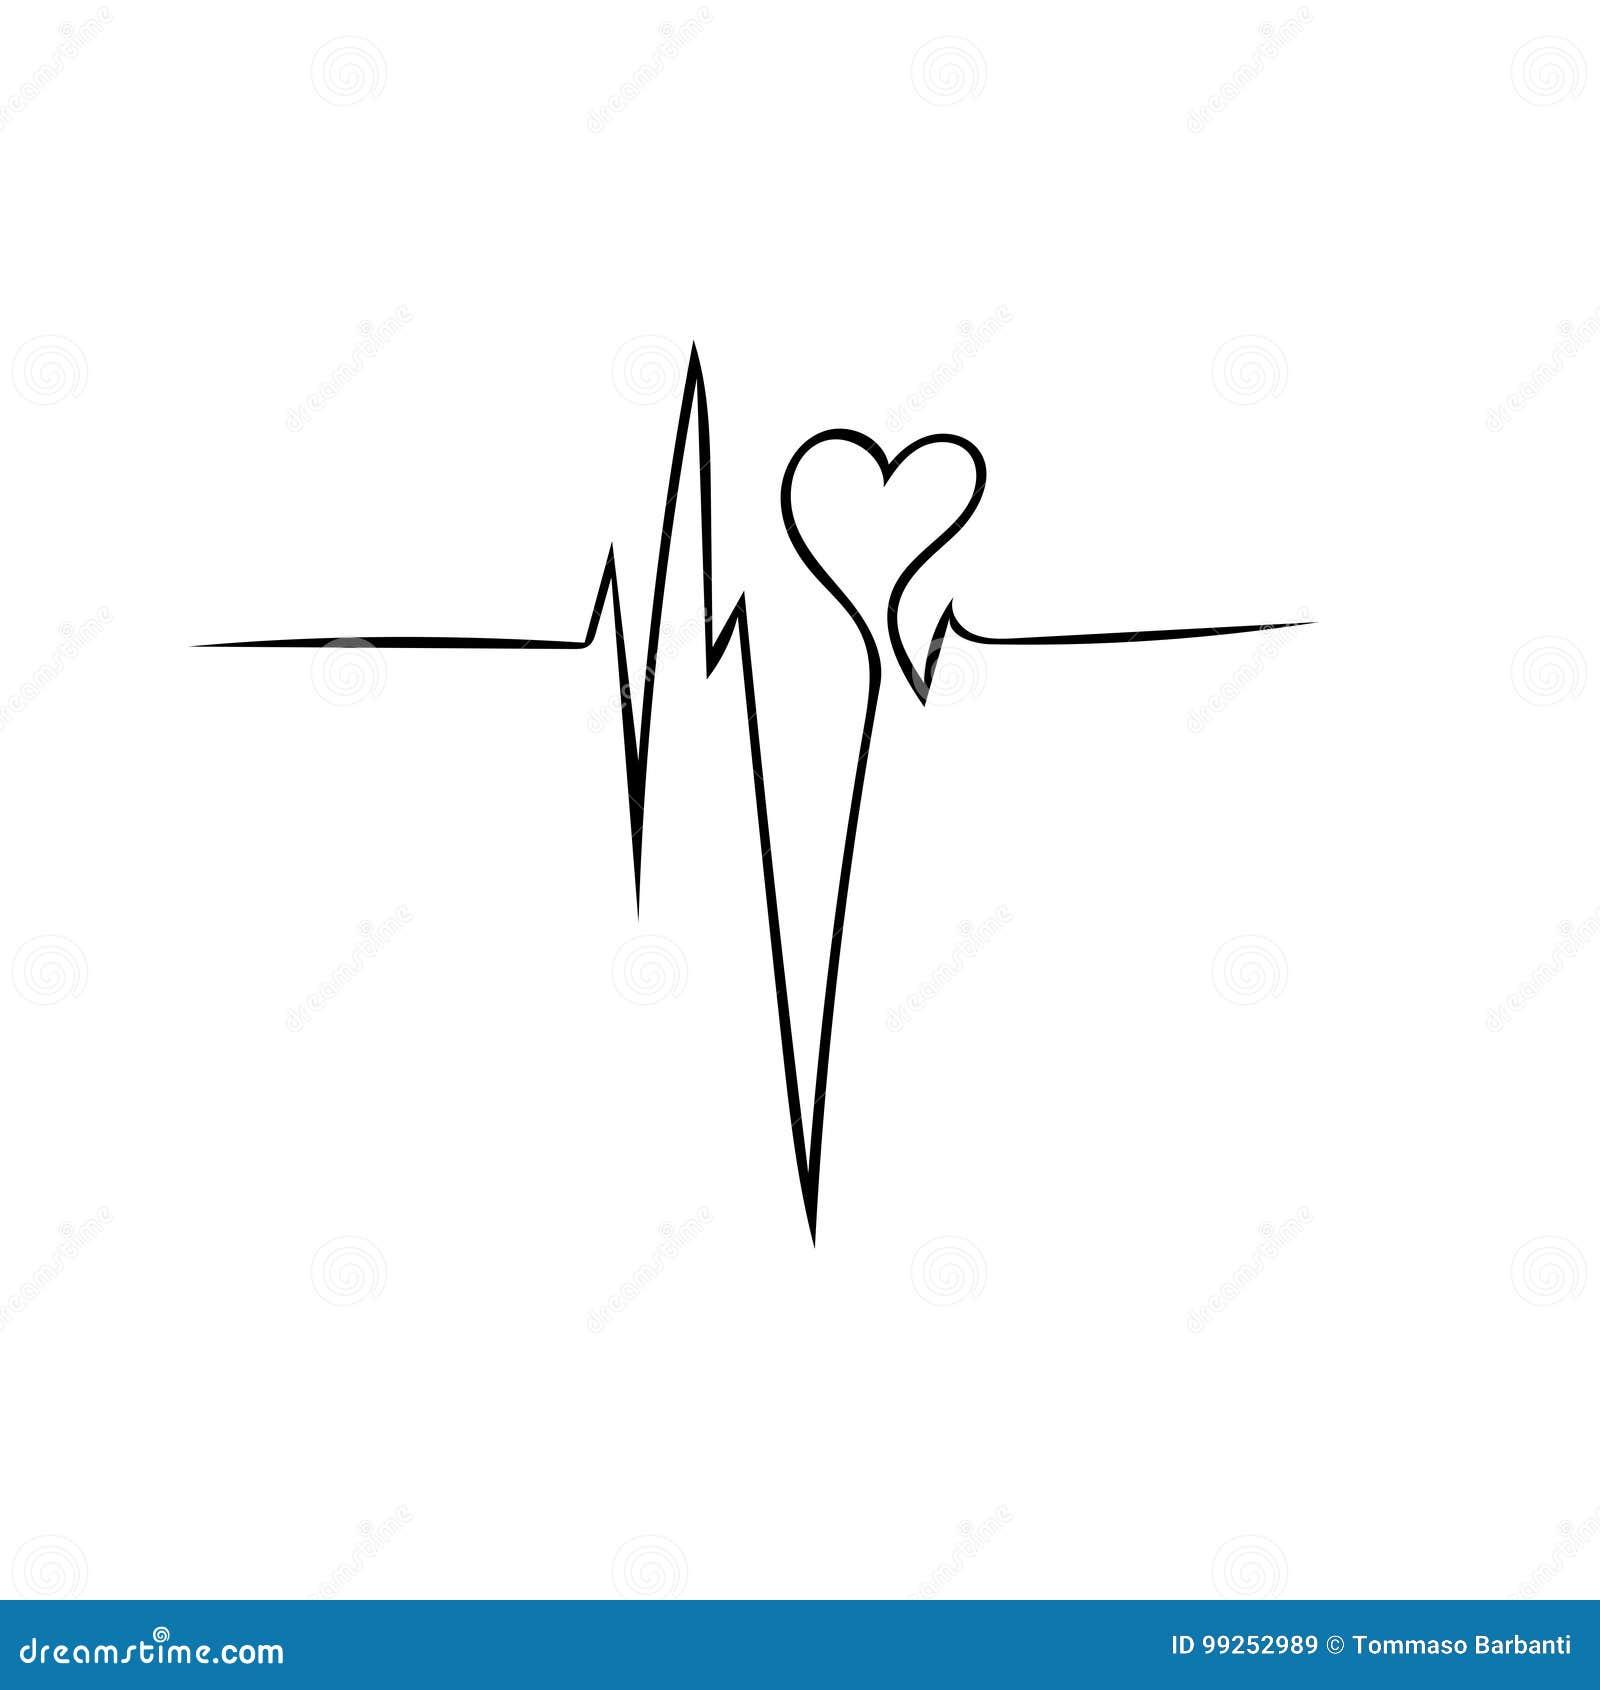 Heart beat - Love